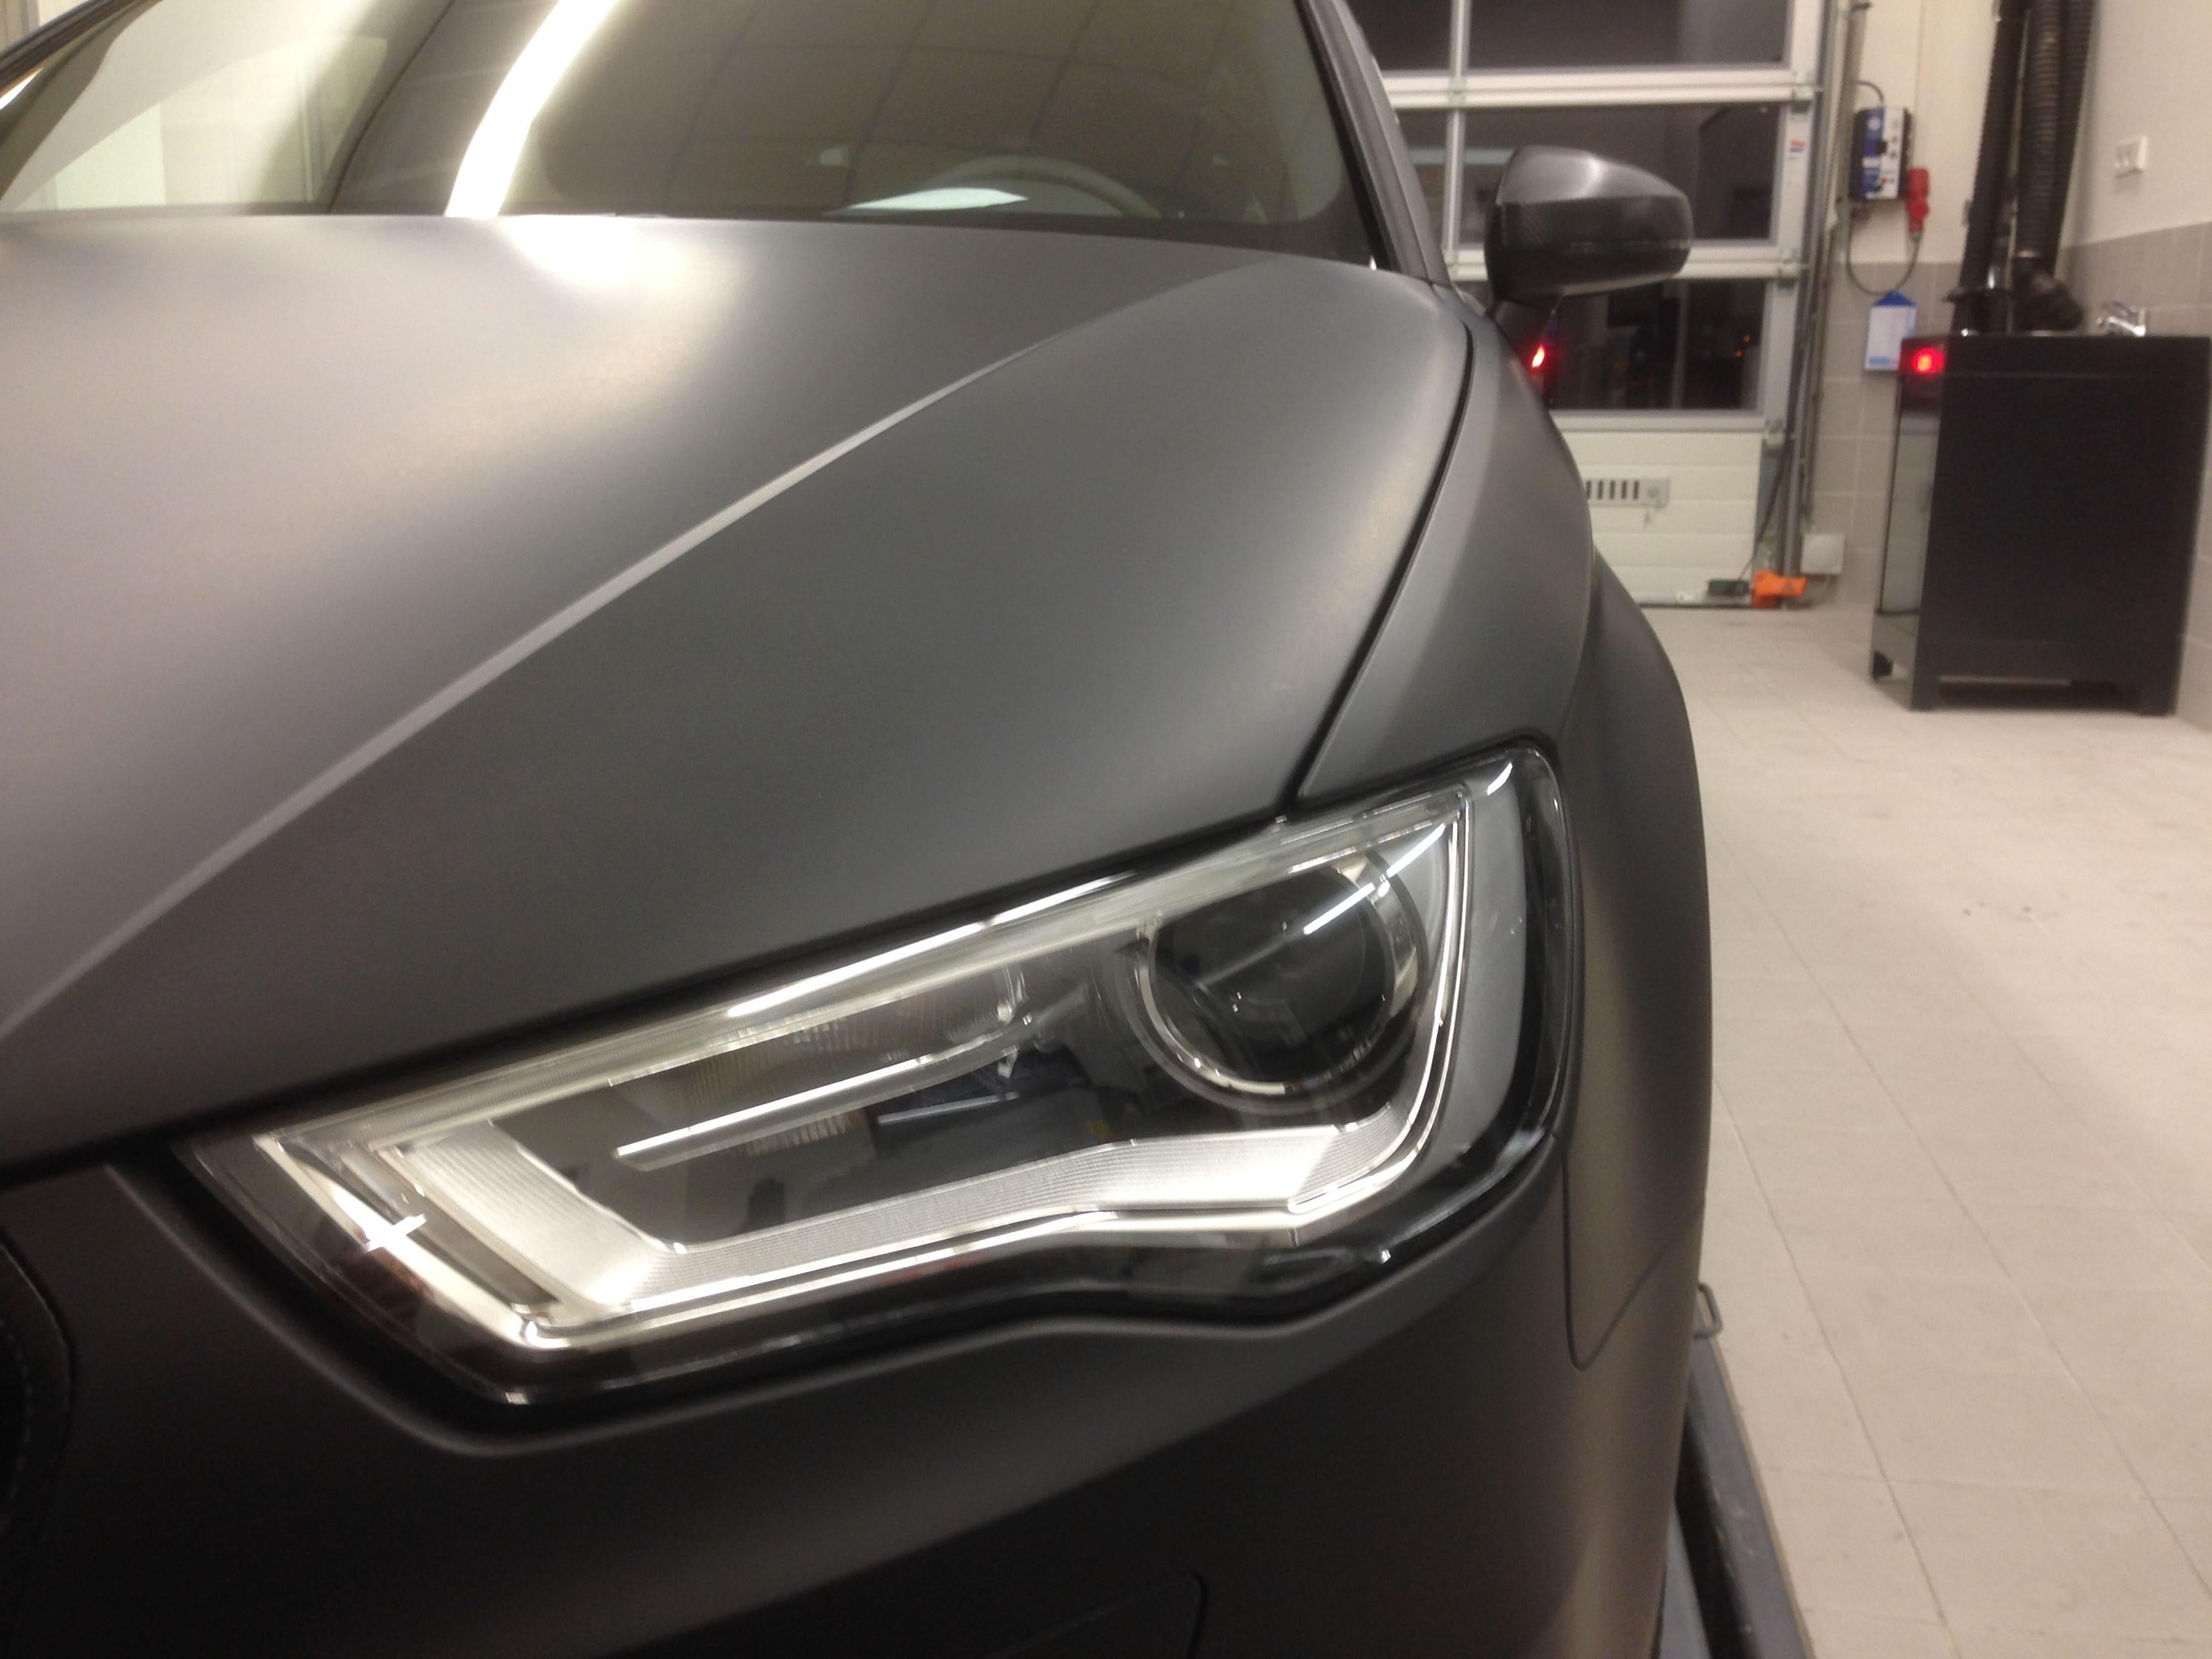 Audi A3 2014 met Mat Zwarte Wrap, Carwrapping door Wrapmyride.nu Foto-nr:4472, ©2021